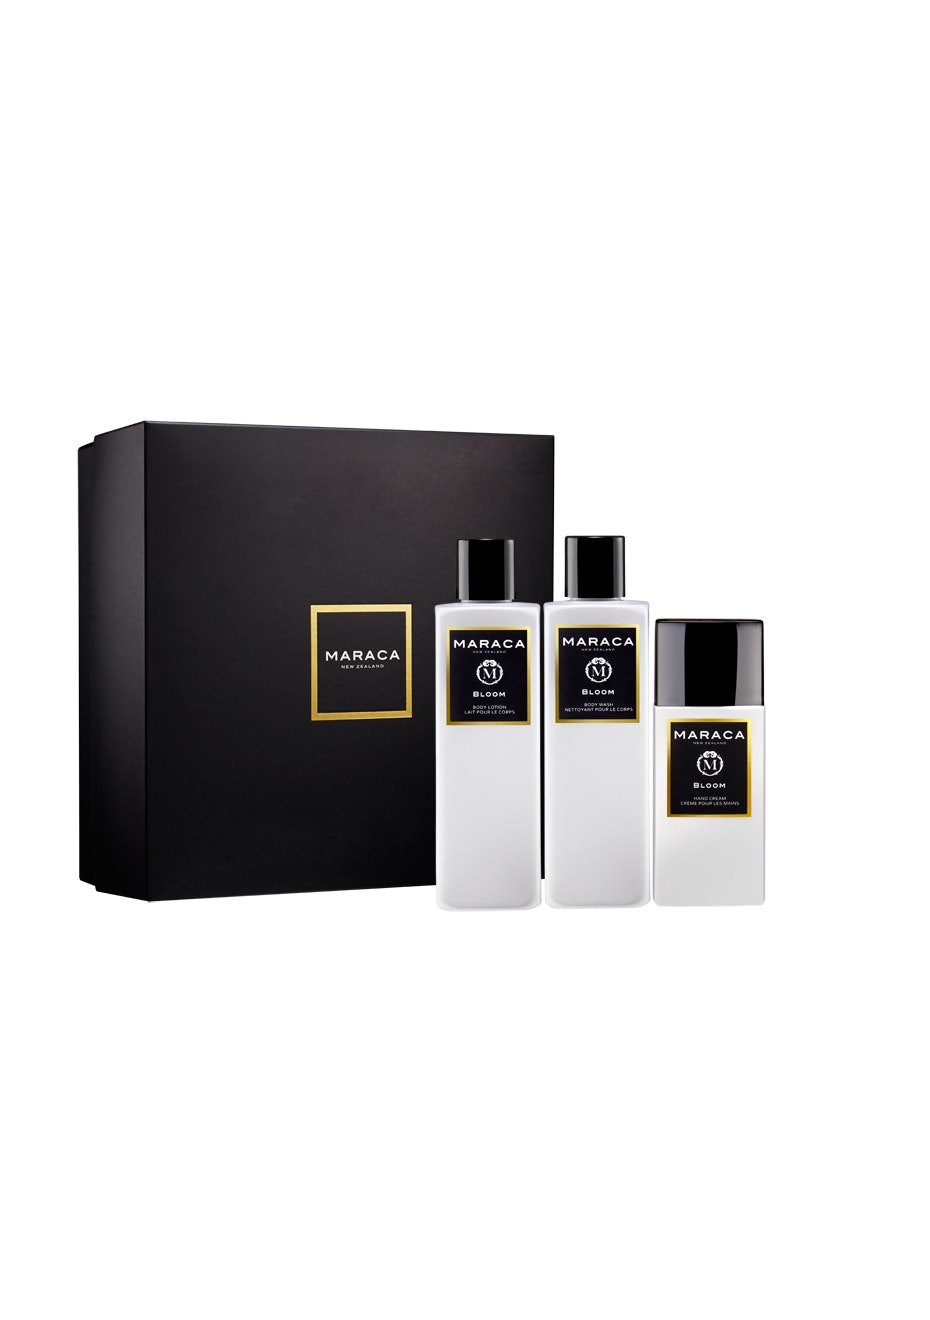 Maraca - Bloom Coffret Set (Body Wash 250ml + Body Lotion 250ml + Hand Cream 100ml)